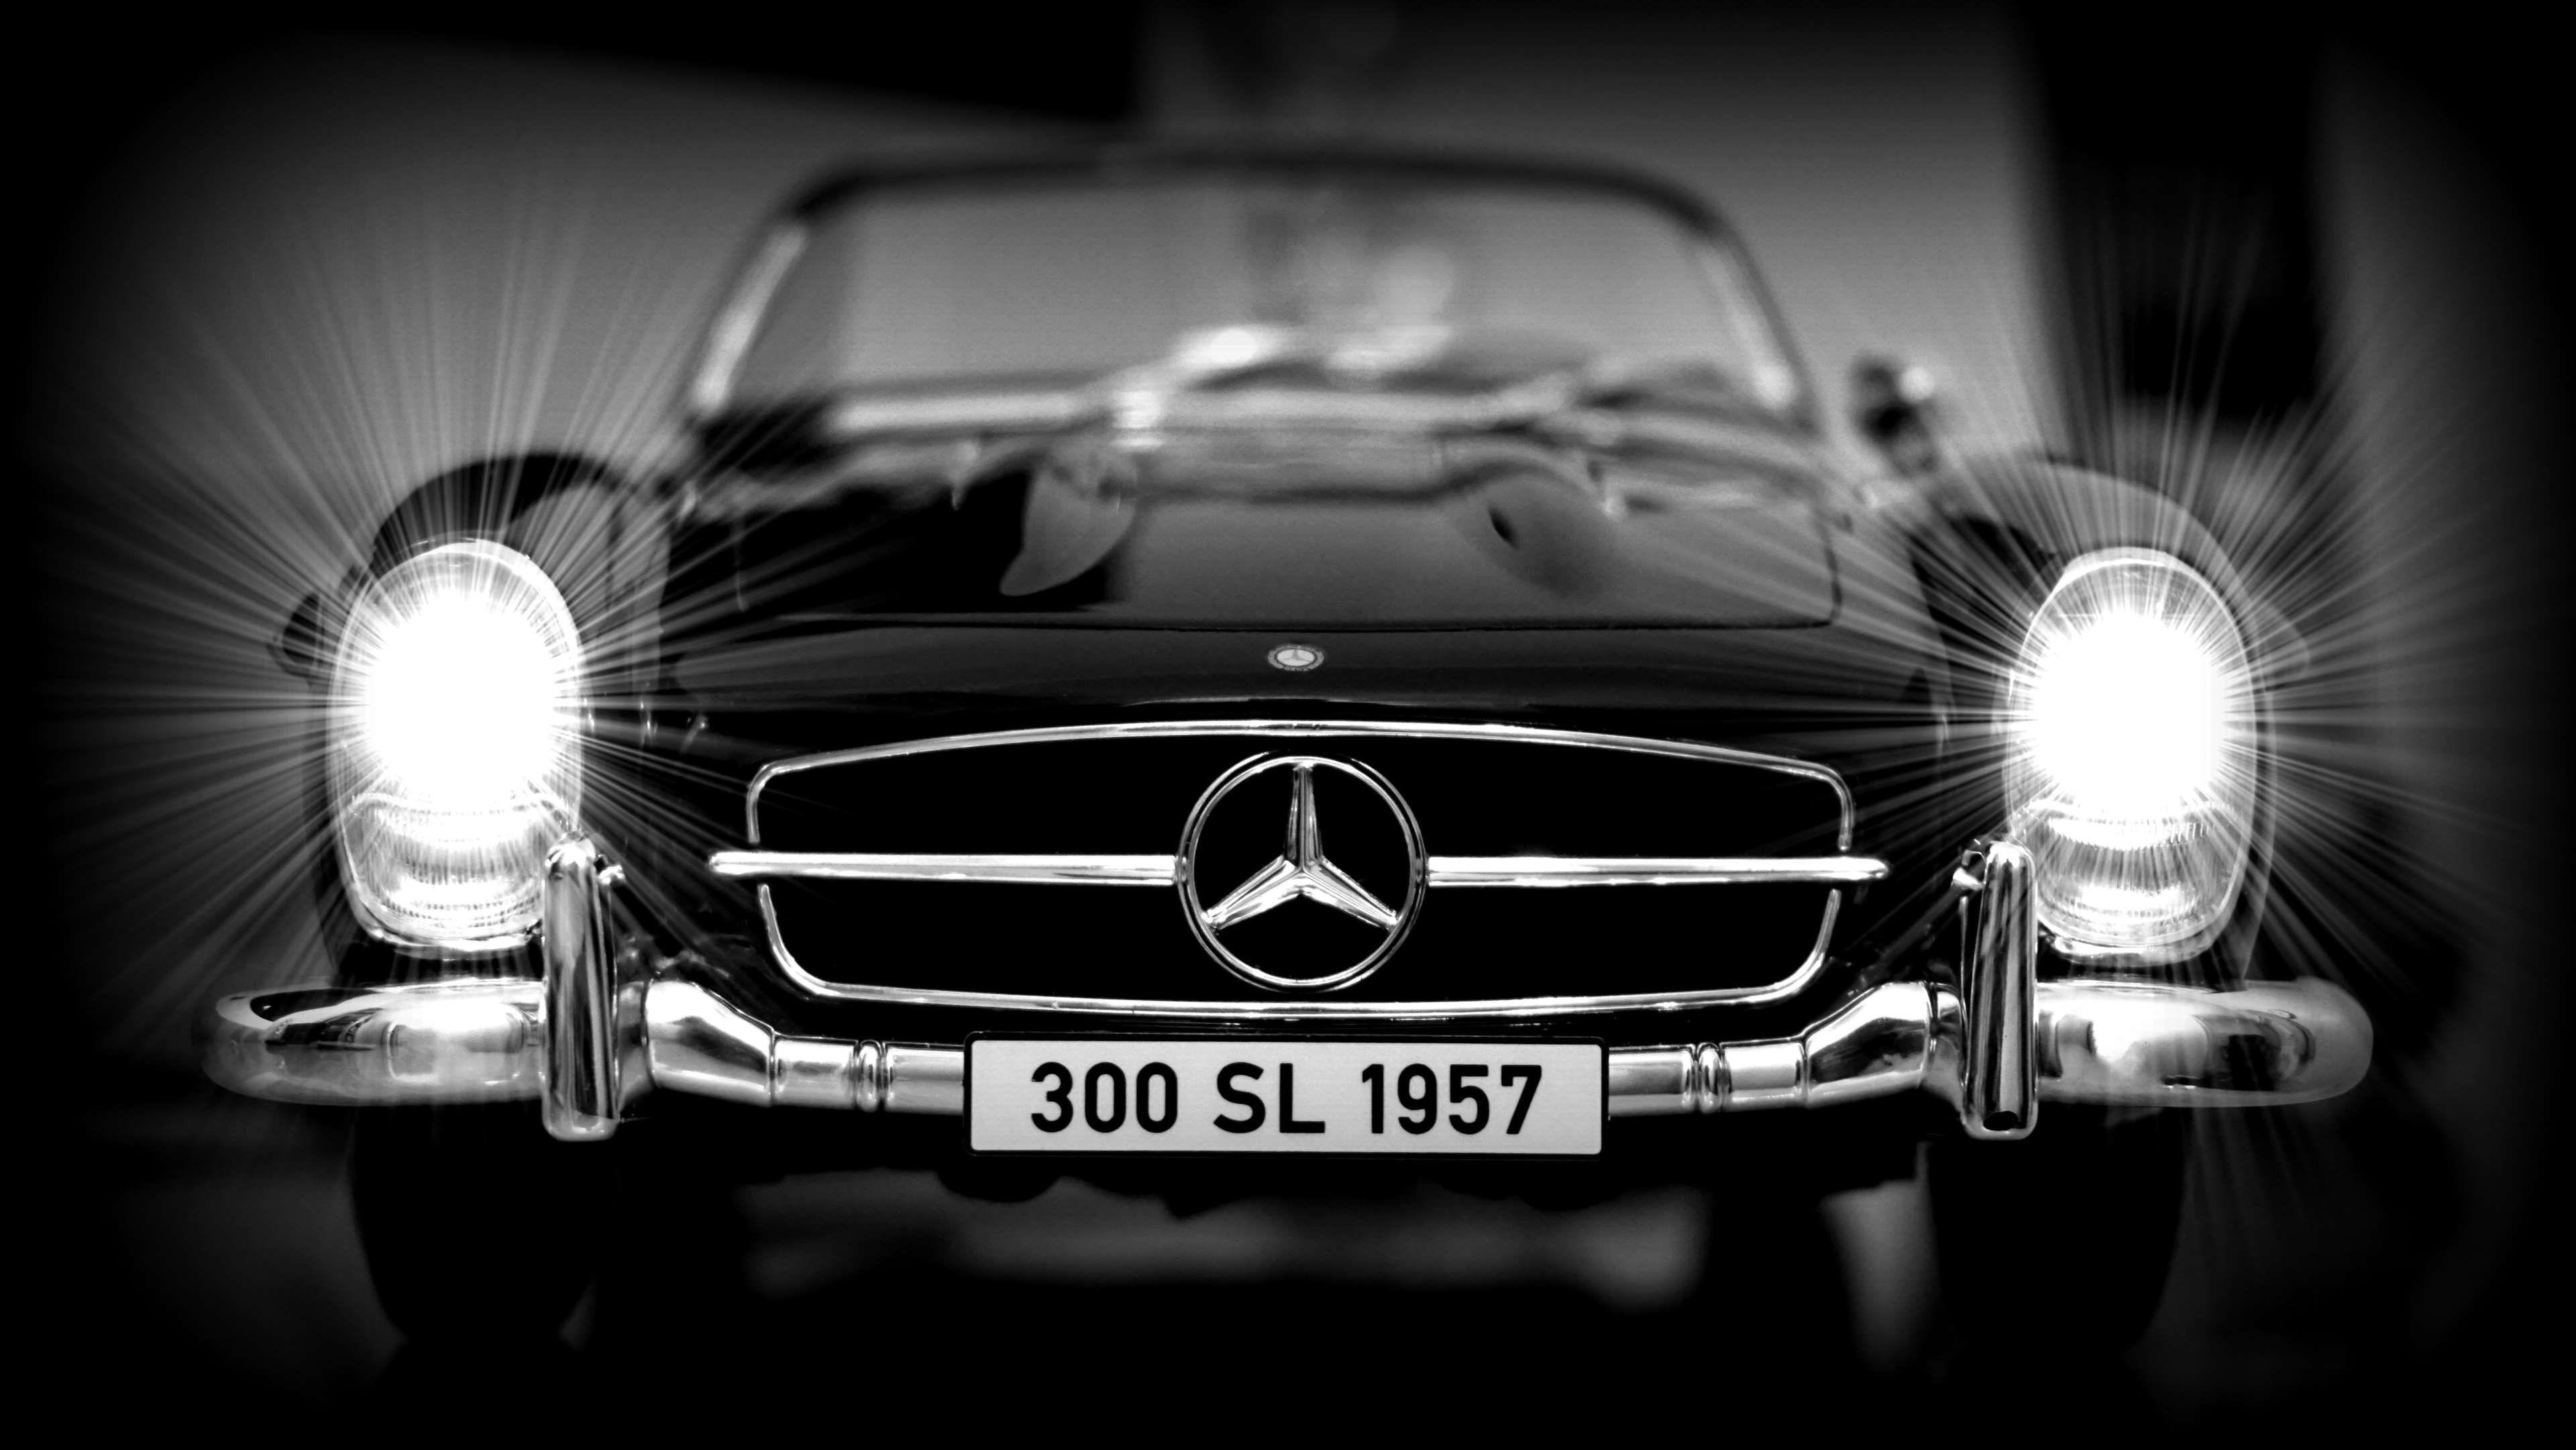 300 sl #auto #automobile #automotive #badge #black black white #bran